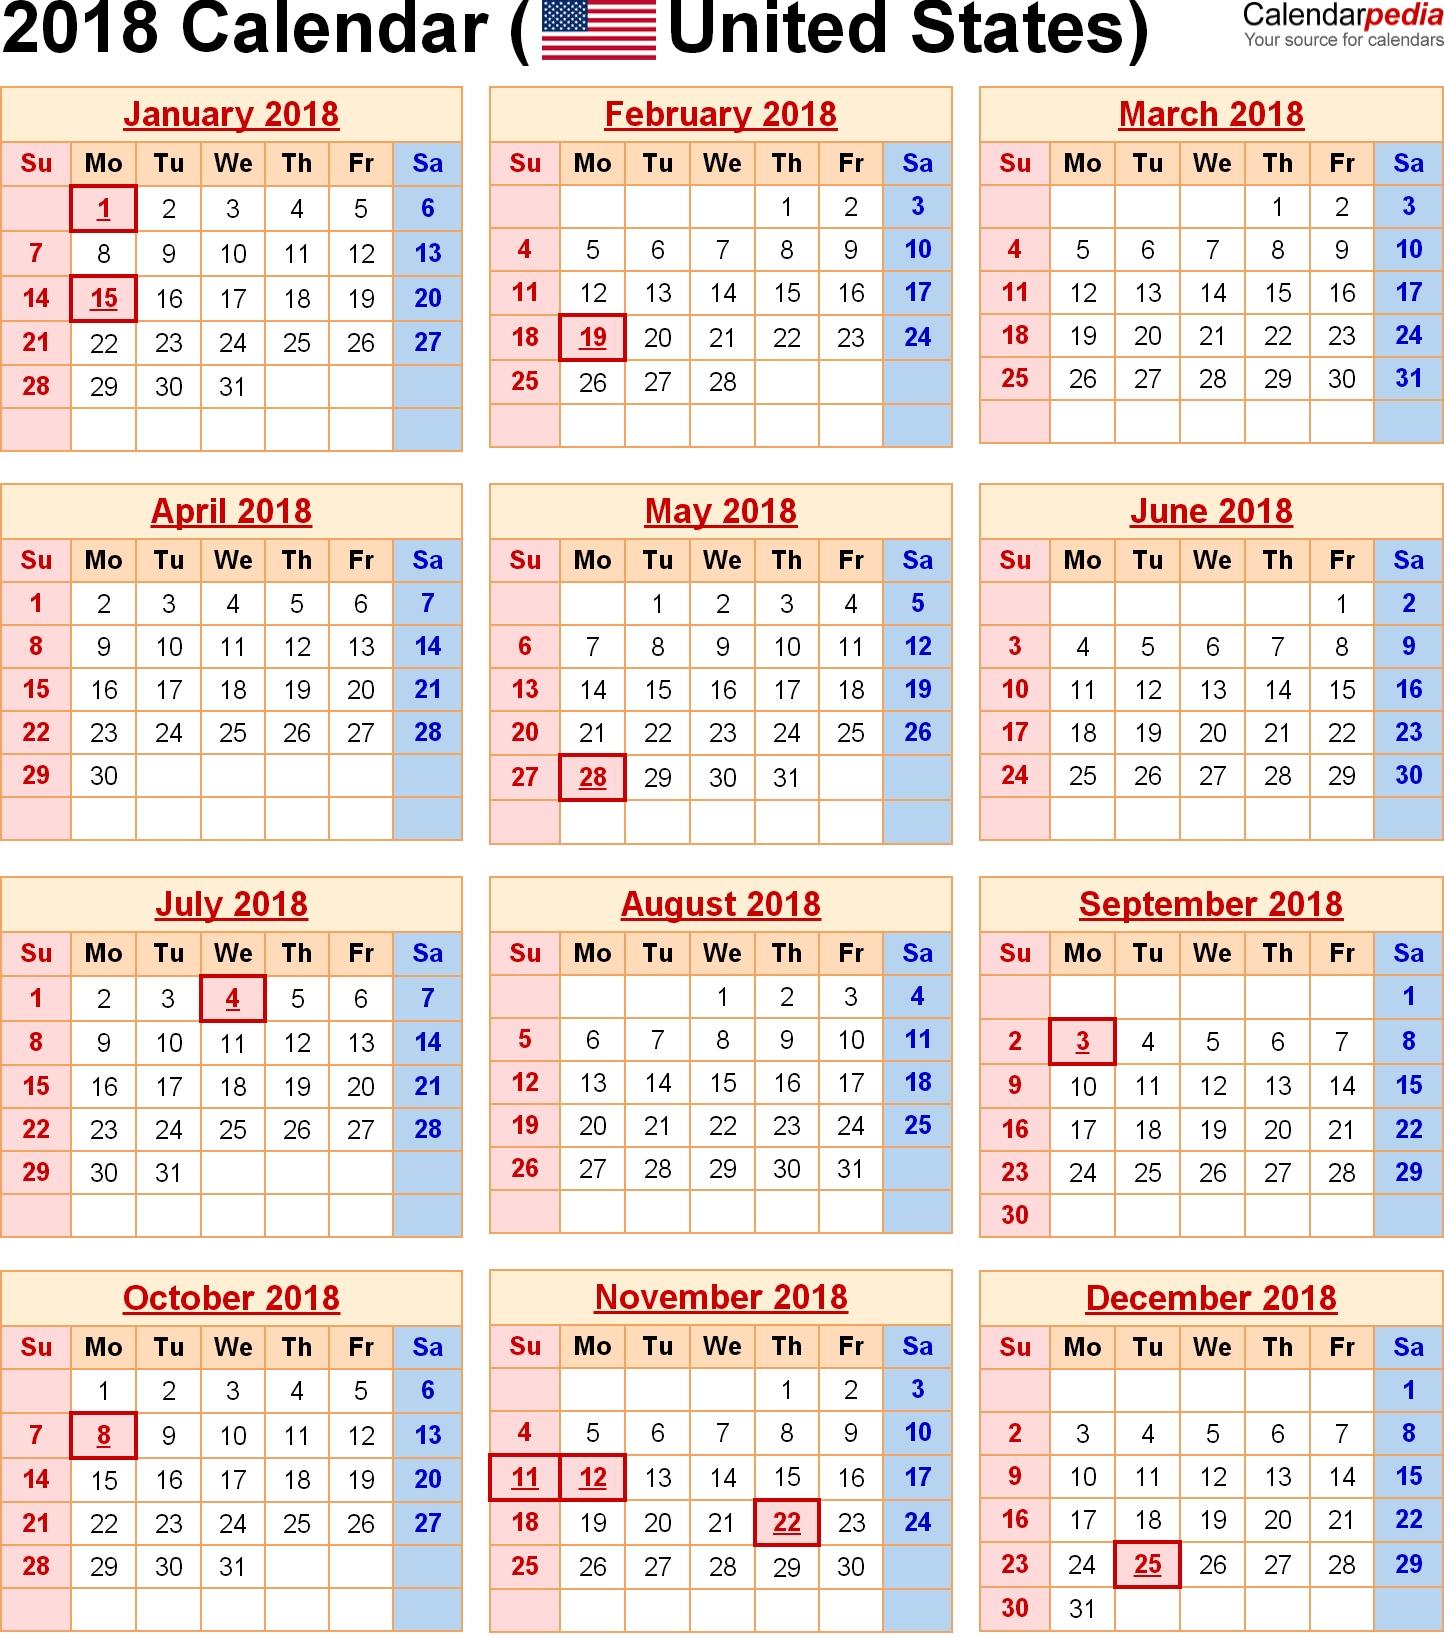 2018 Calendar United States Holidays | 2018 Calendars | Pinterest Calendar 2019 With Us Holidays